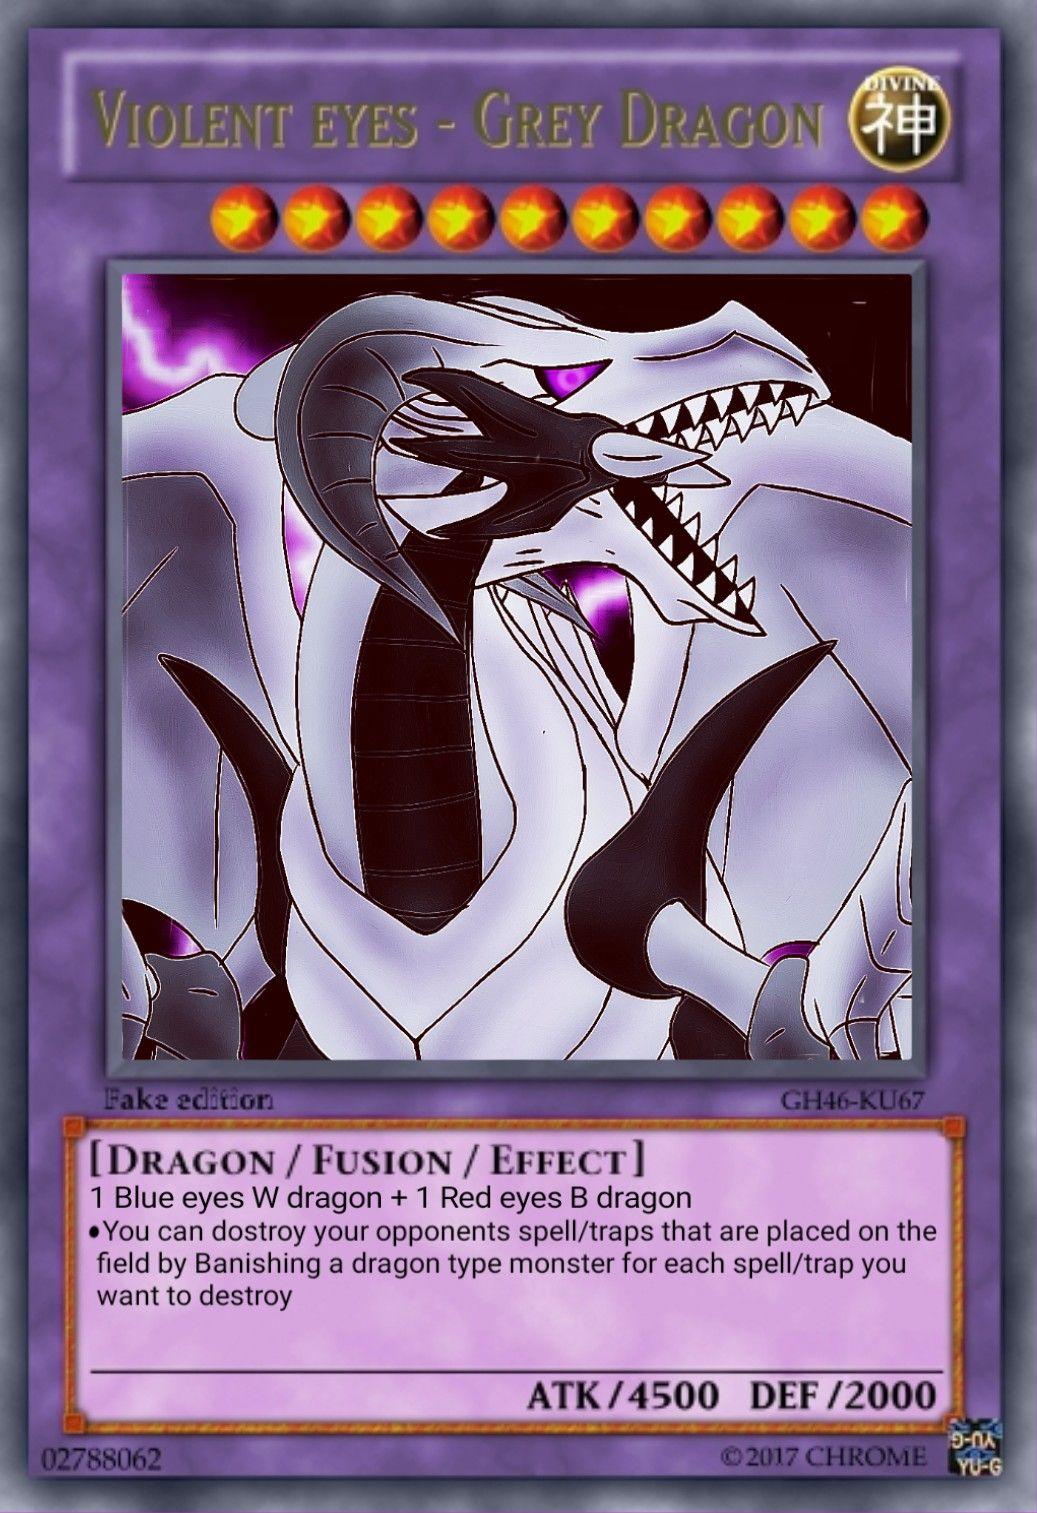 Fake fusion yugioh card